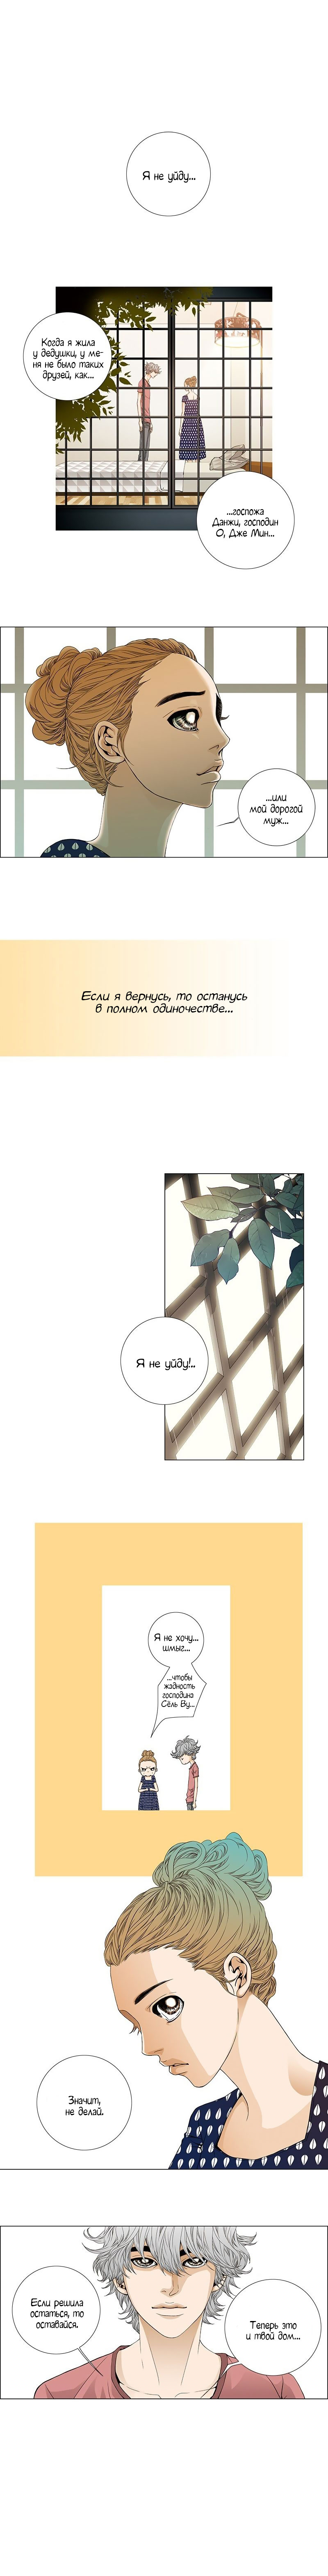 https://r1.ninemanga.com/comics/pic2/29/28573/344299/151207754873.jpg Page 2